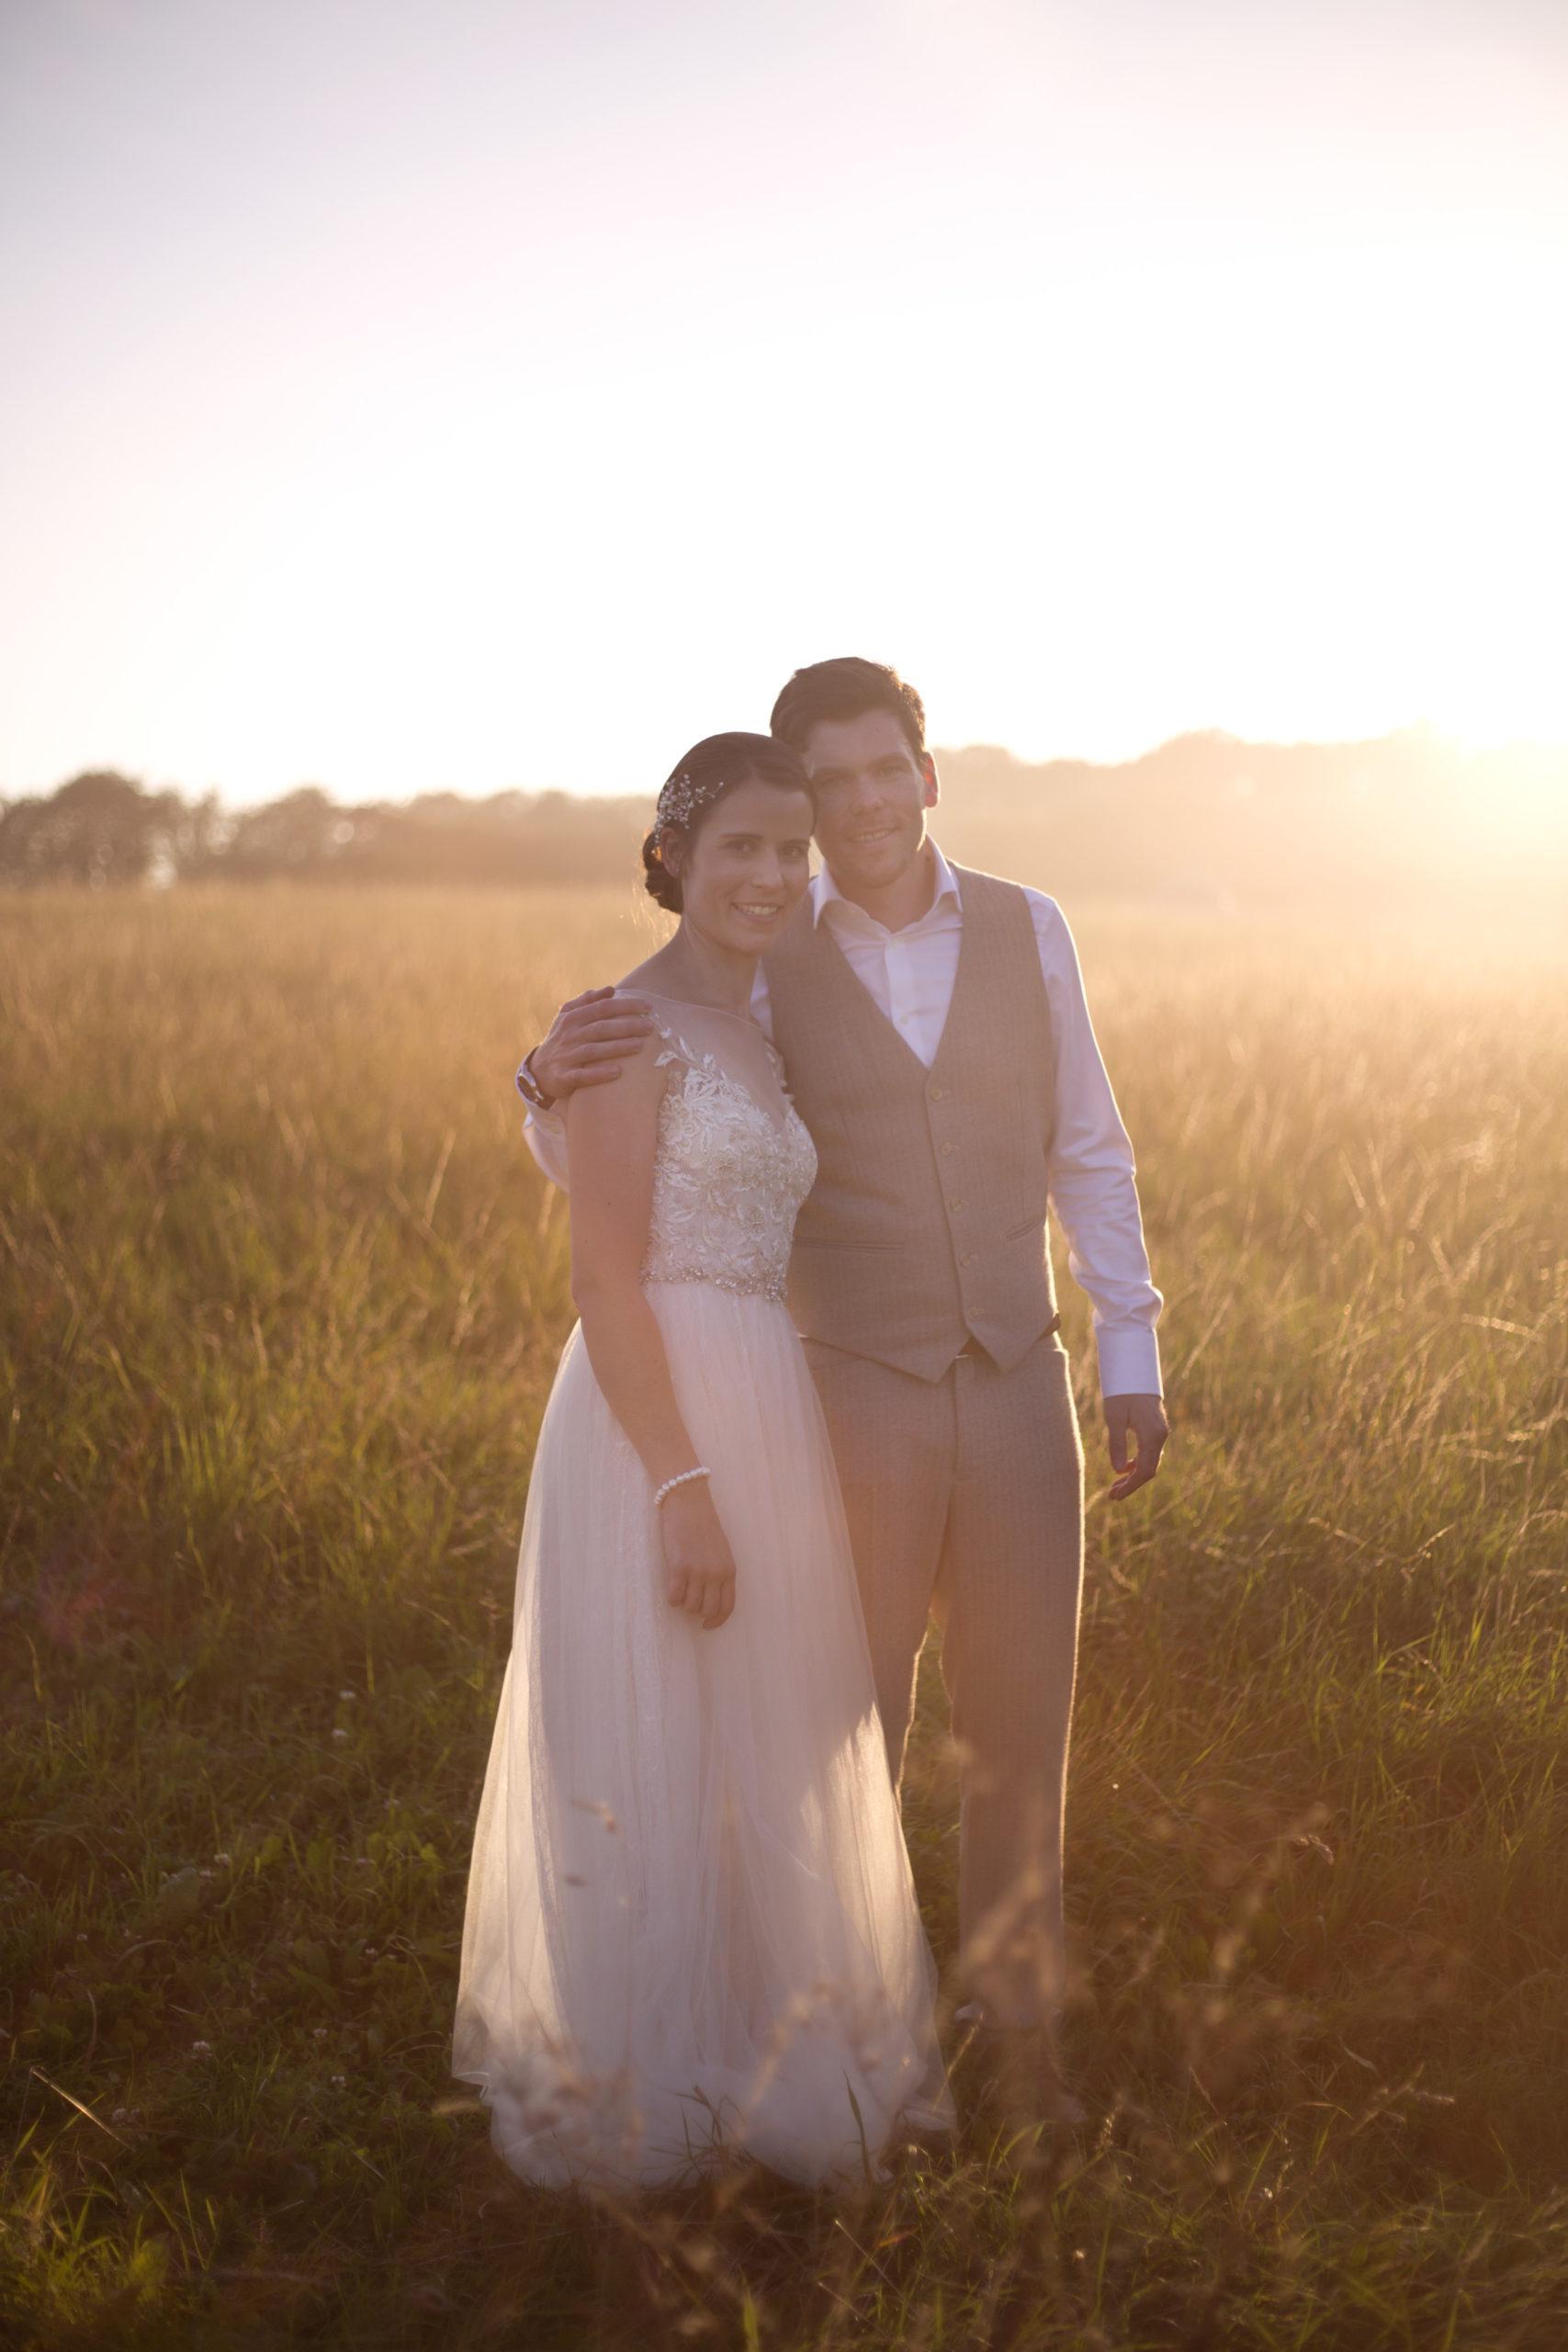 Newlyweds embrace in hazy sunset golden hour photo Cripps barn outdoor wedding photographer